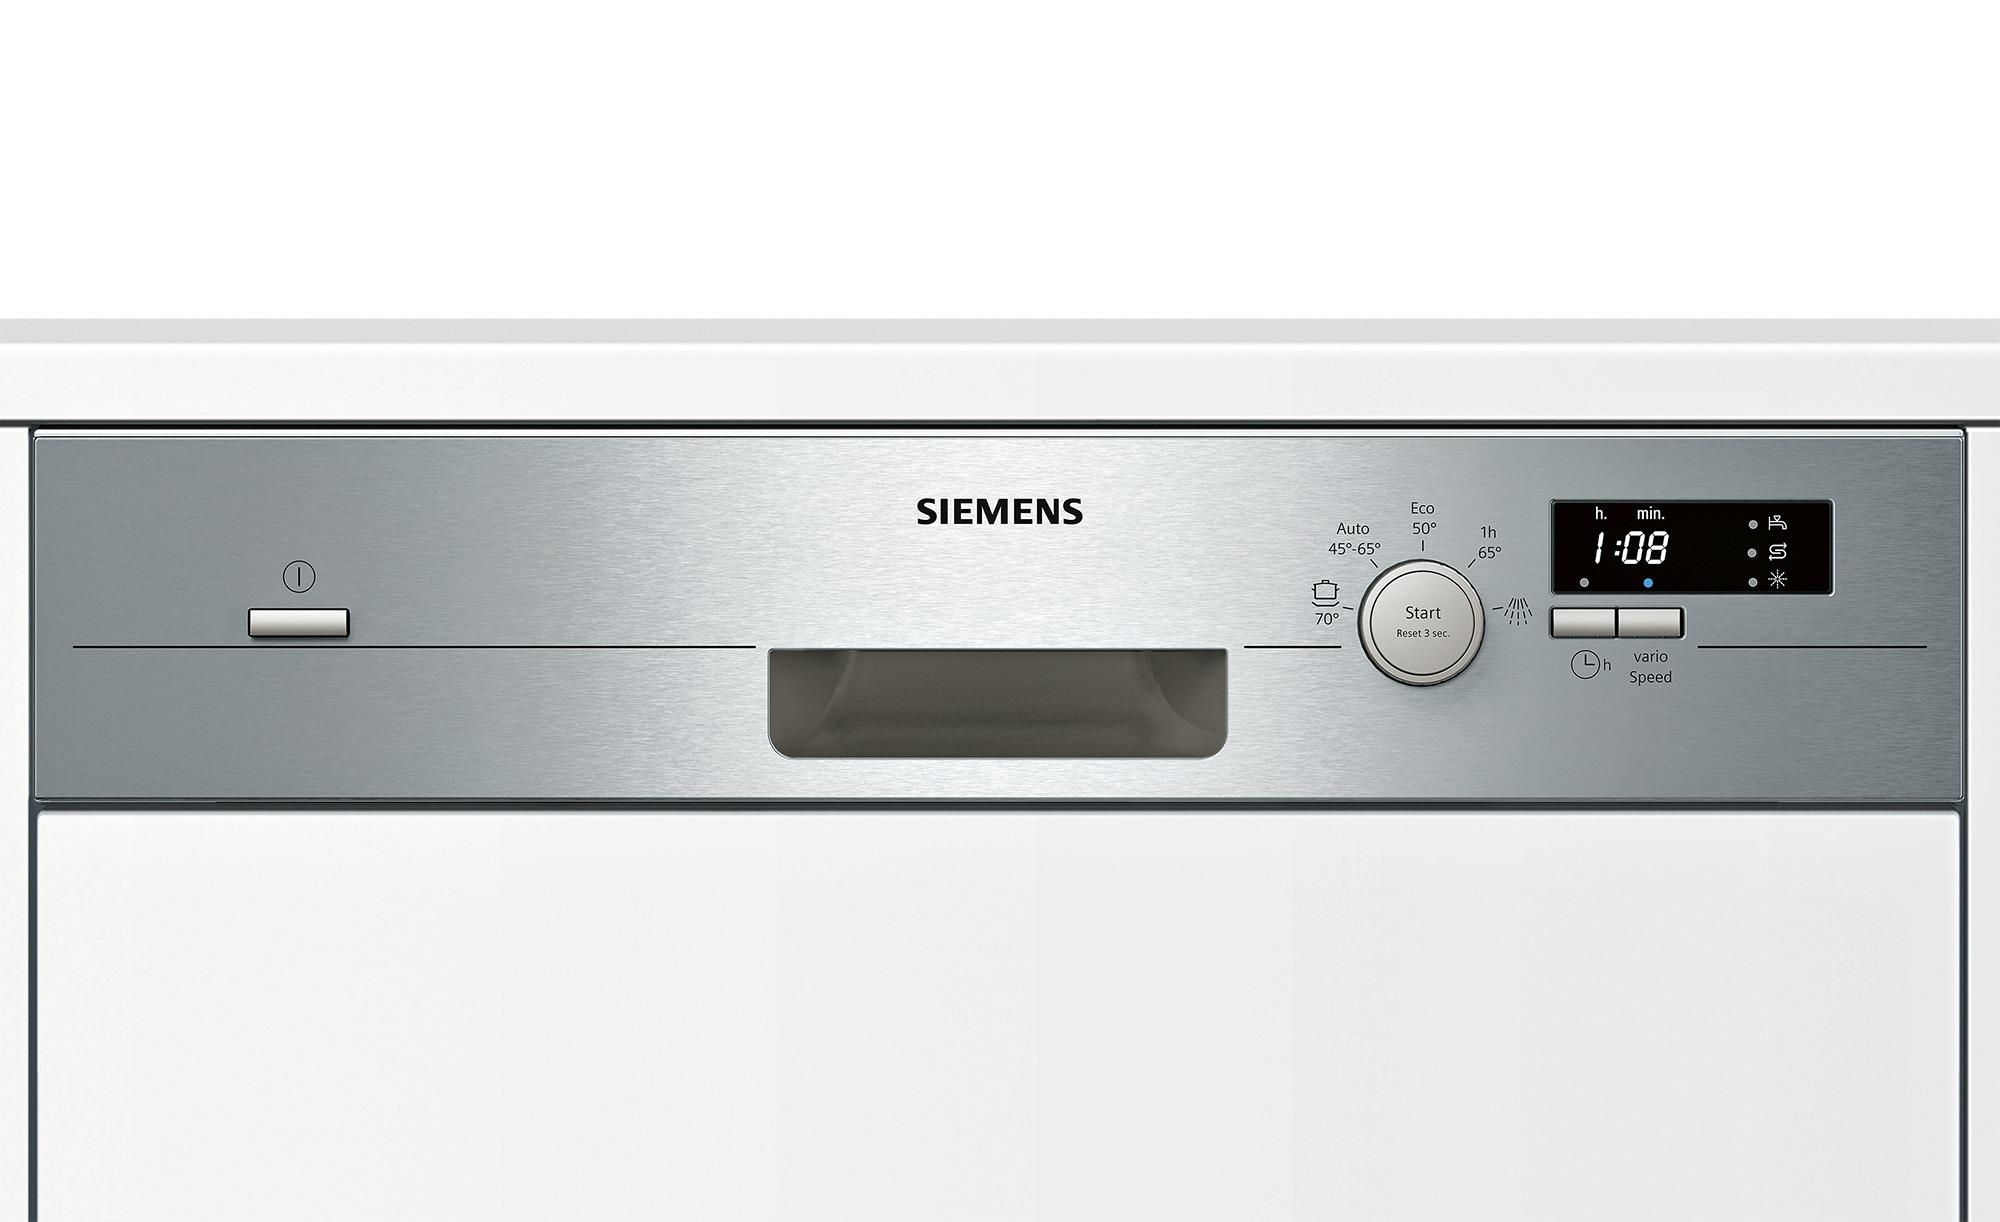 Siemens Kühlschrank Reset : Siemens einbau geschirrspüler sn 515 s 00 ae höffner